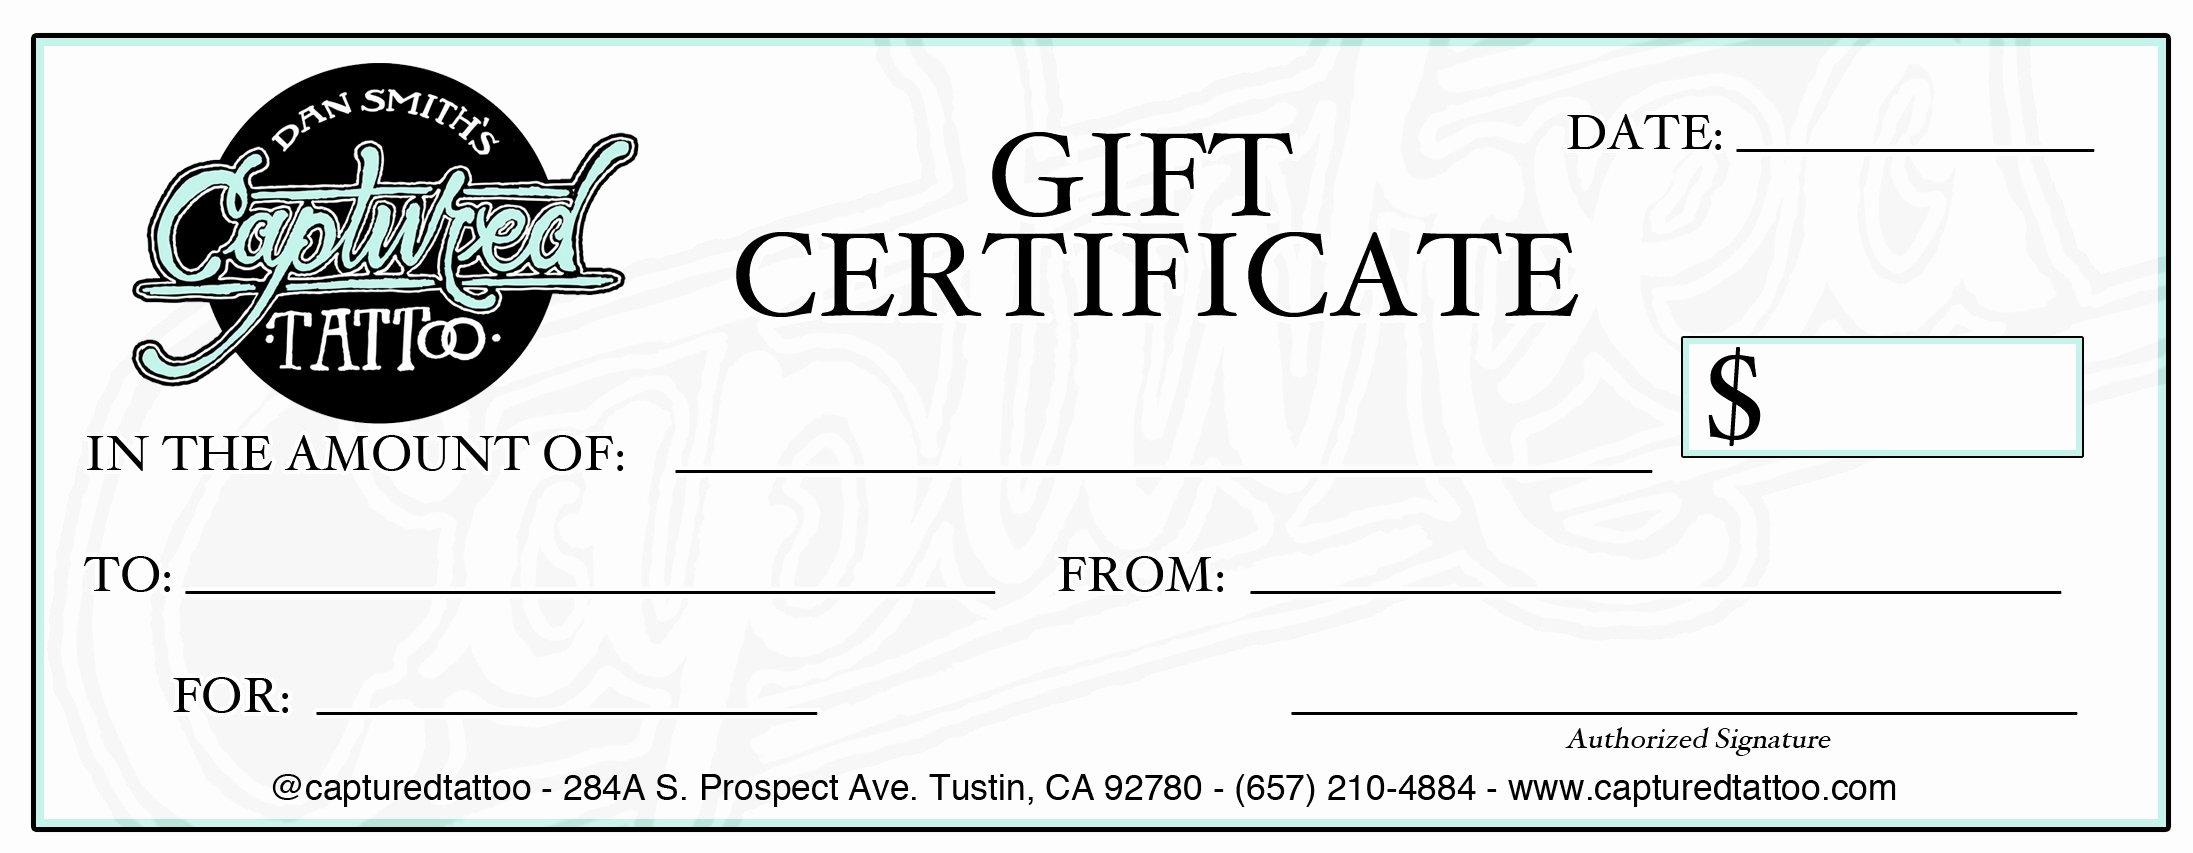 Gift Certificate Template Google Docs Beautiful Template